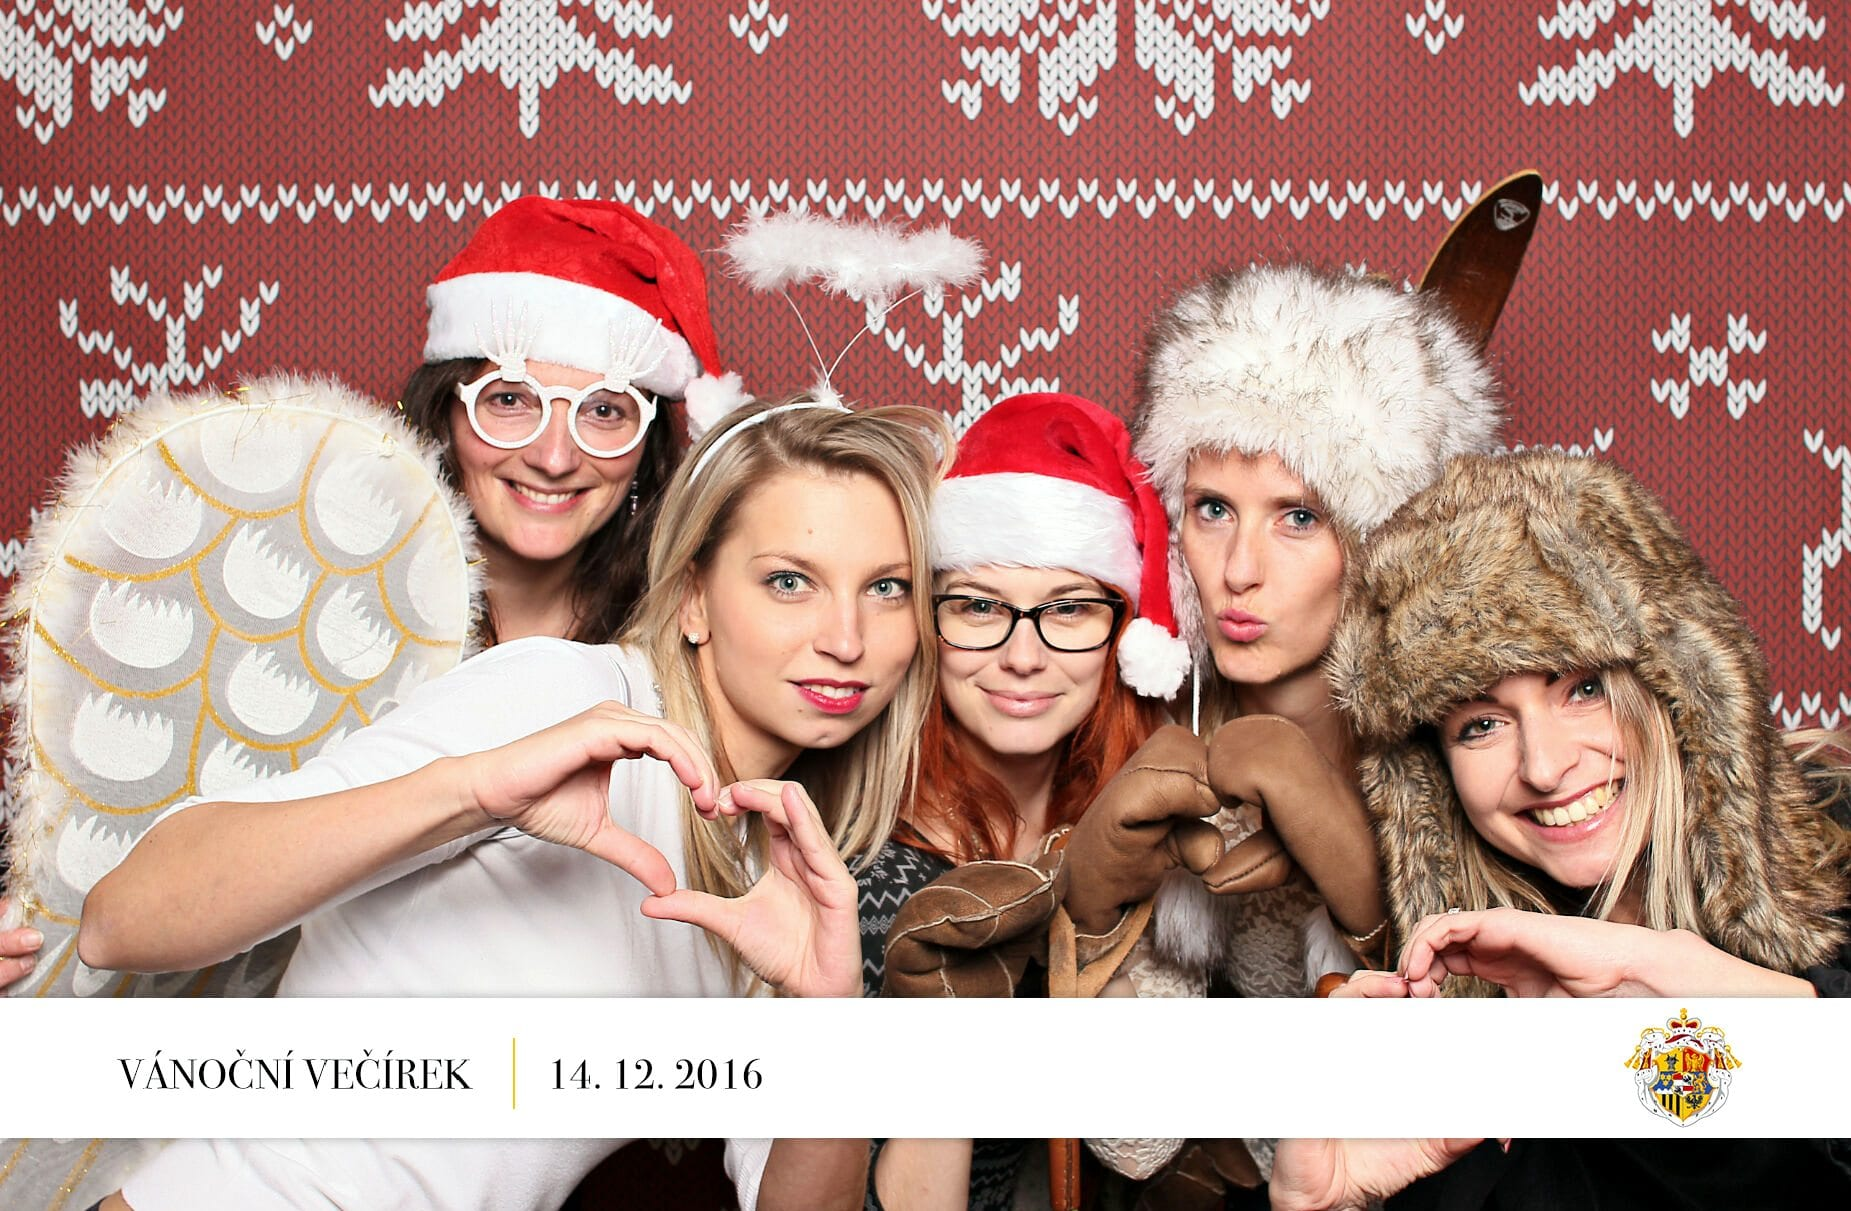 fotokoutek-zamek-nelahozeves-vanocni-vecirek-14-12-2016-185861